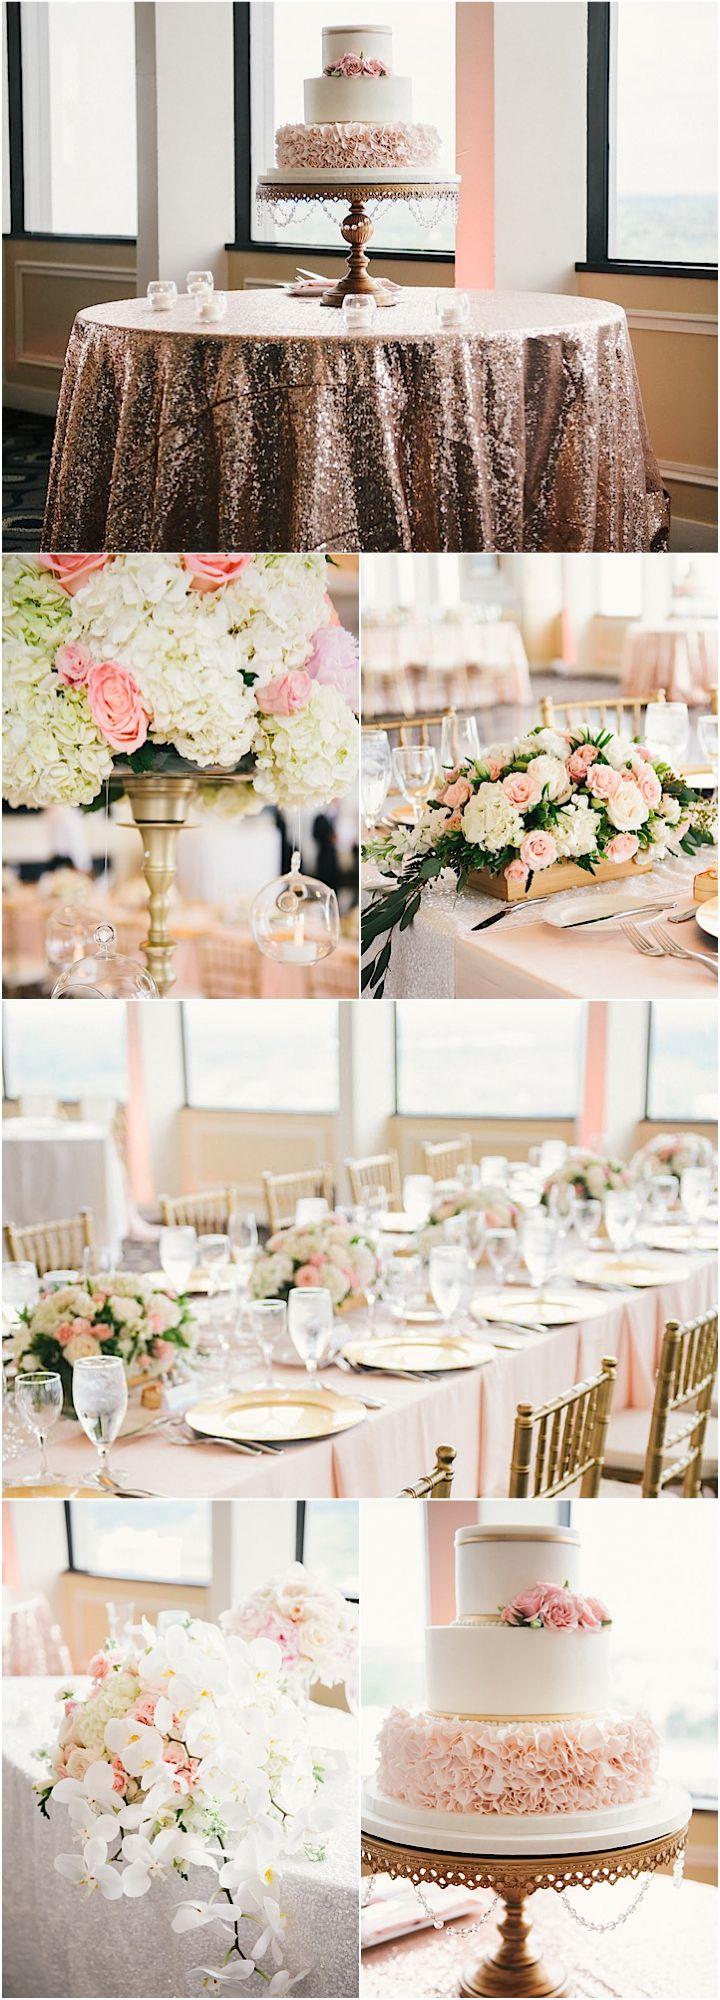 543 best Wedding Receptions images on Pinterest   Wedding ideas ...